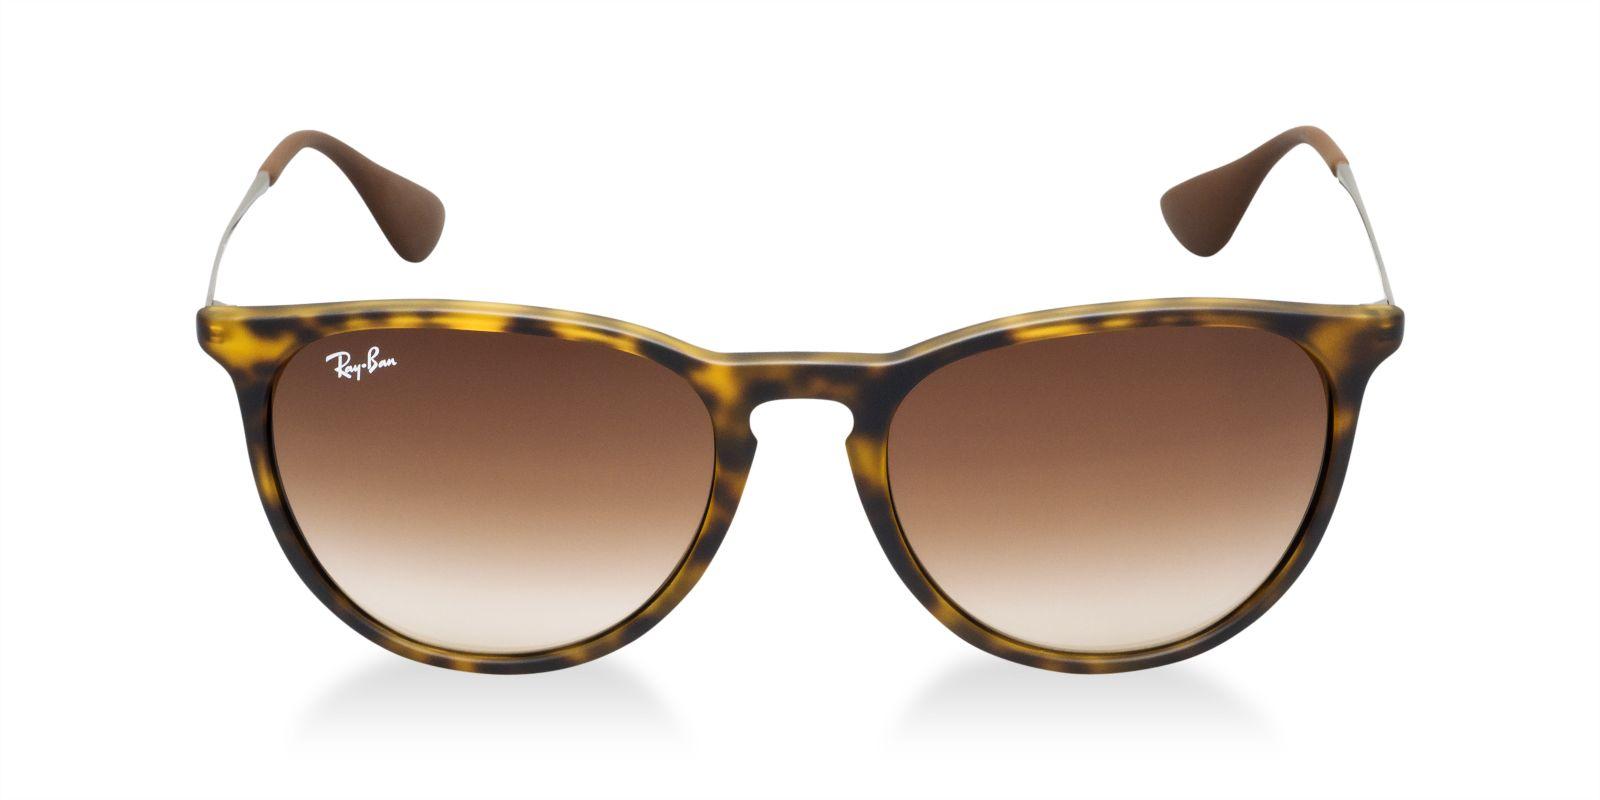 Ray Ban Rb4171 865 13 Tortoise Erika Sunglasses Lux Eyewear